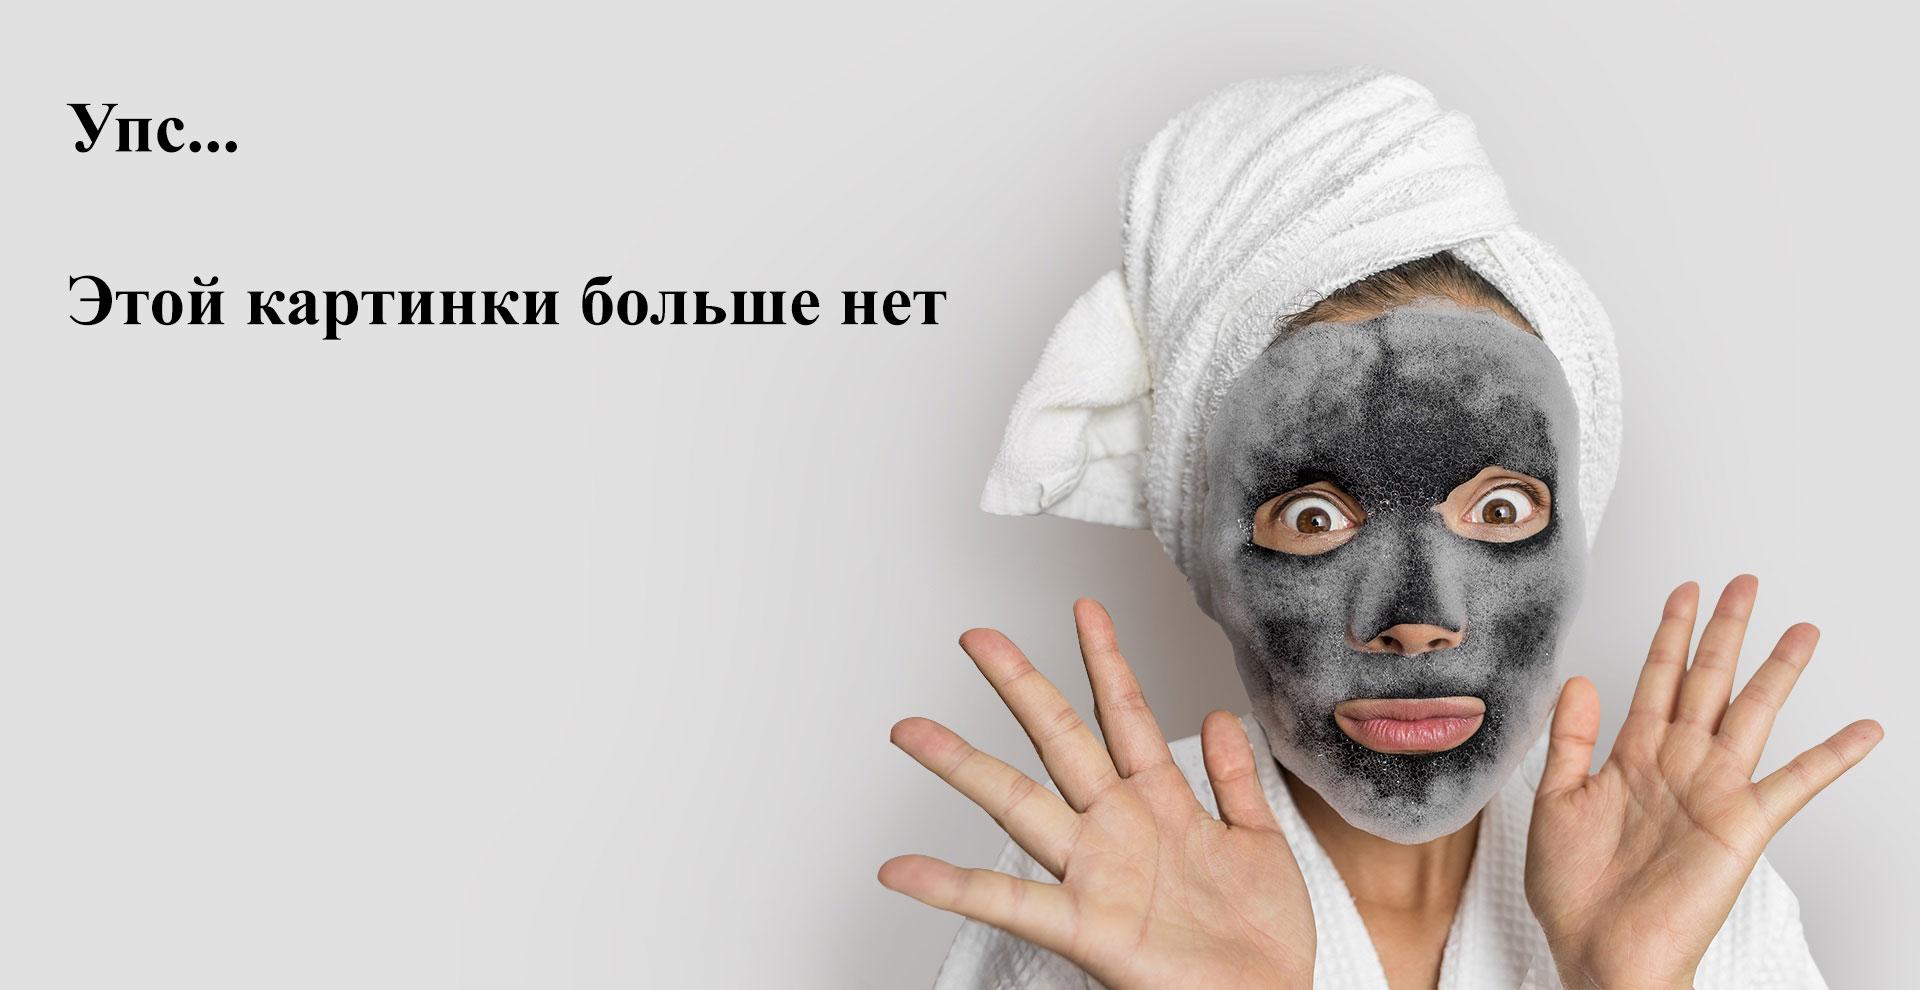 ruNail, Гель-лак Cat's eye №2929, Богемская кошка